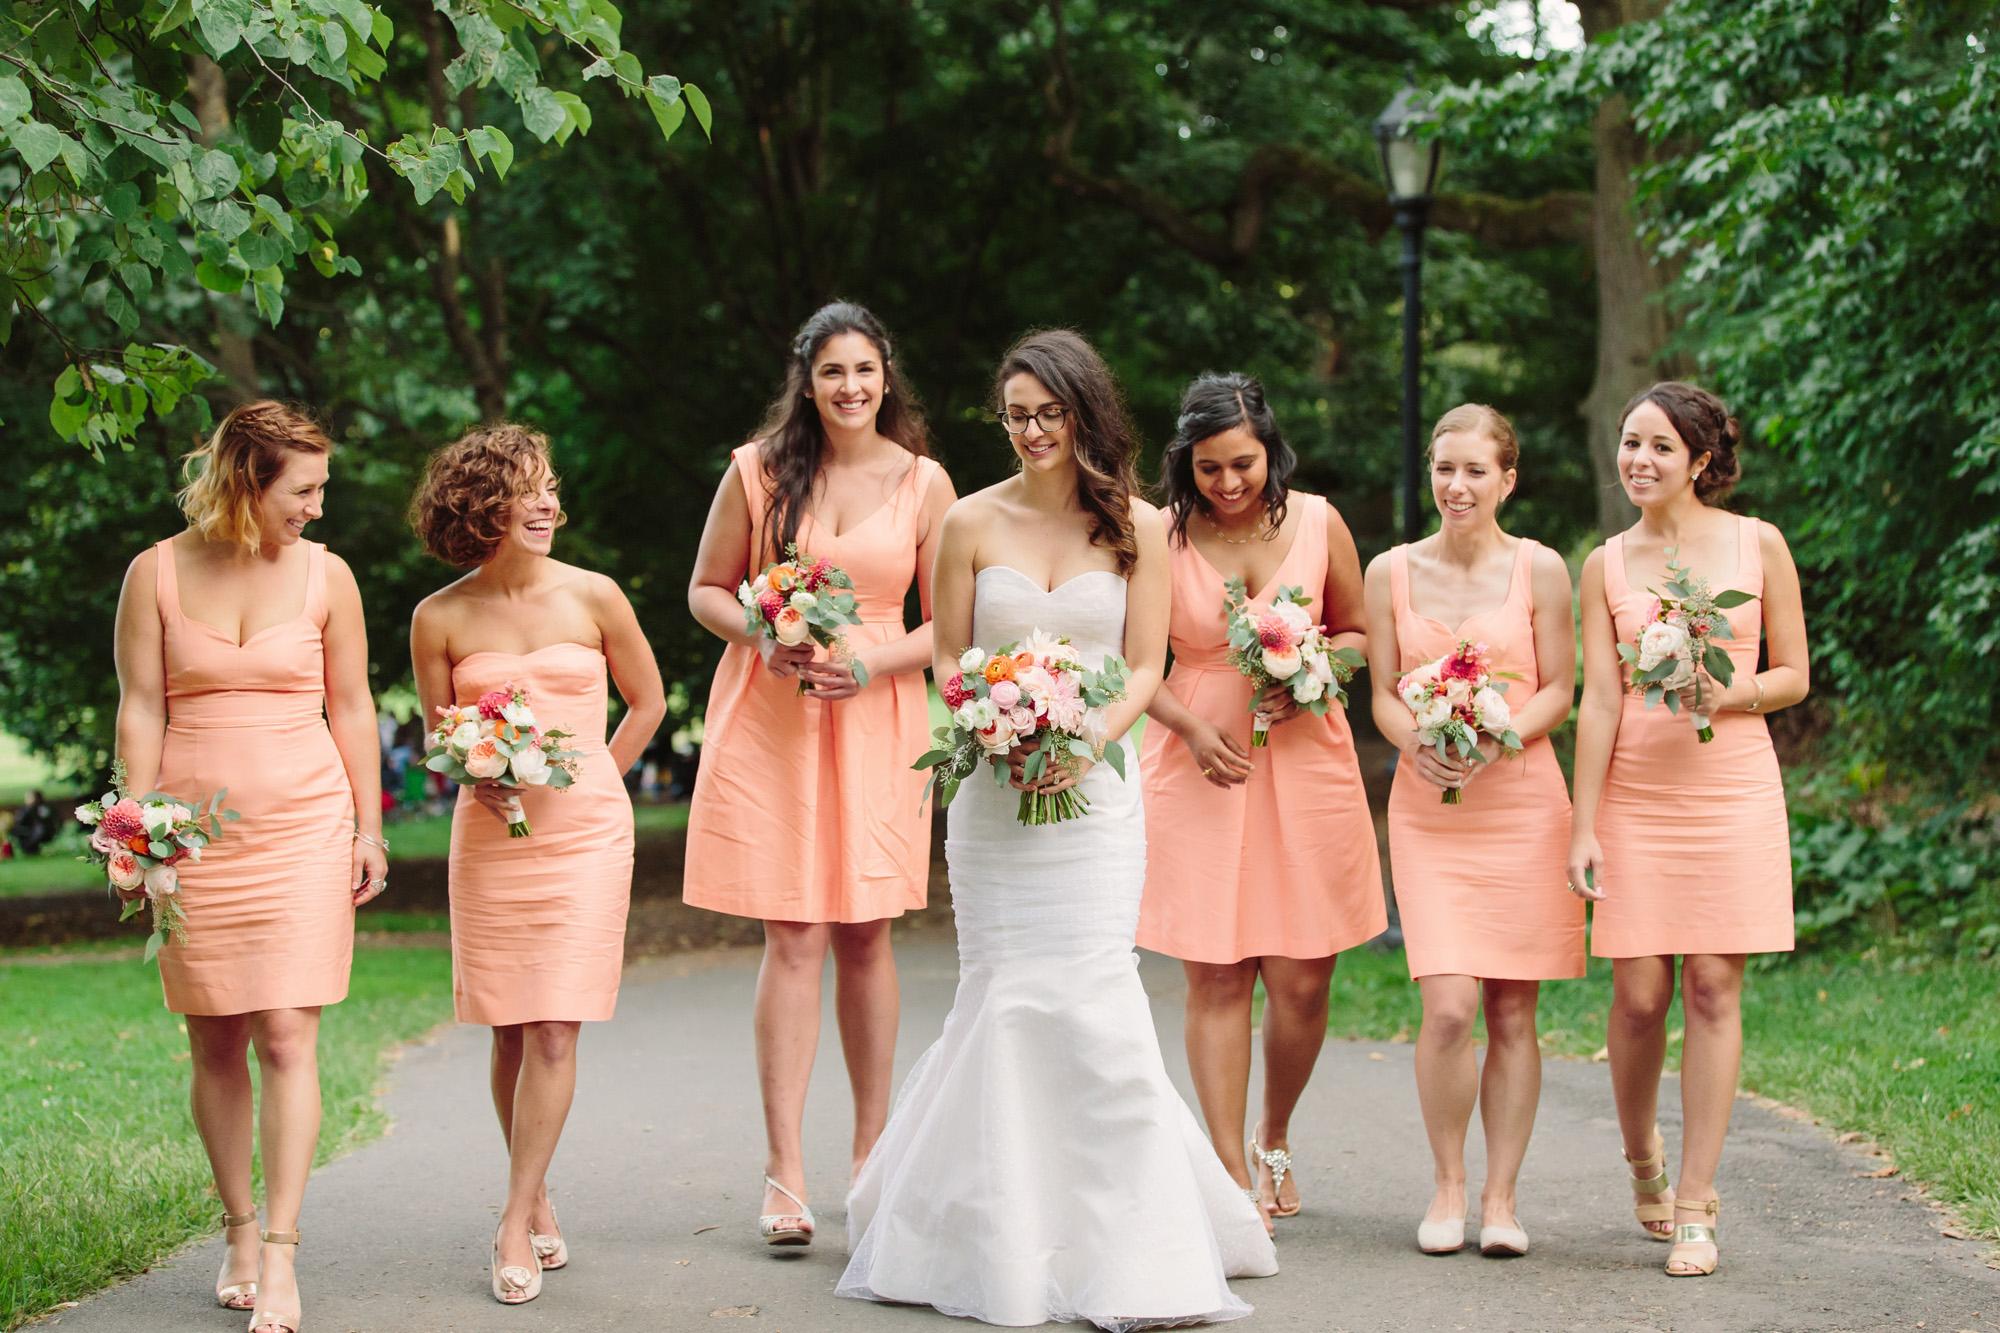 26_Kate_Sam_Picnic_House_Wedding_Brooklyn_NY_Tanya_Salazar_Photography_445.jpg